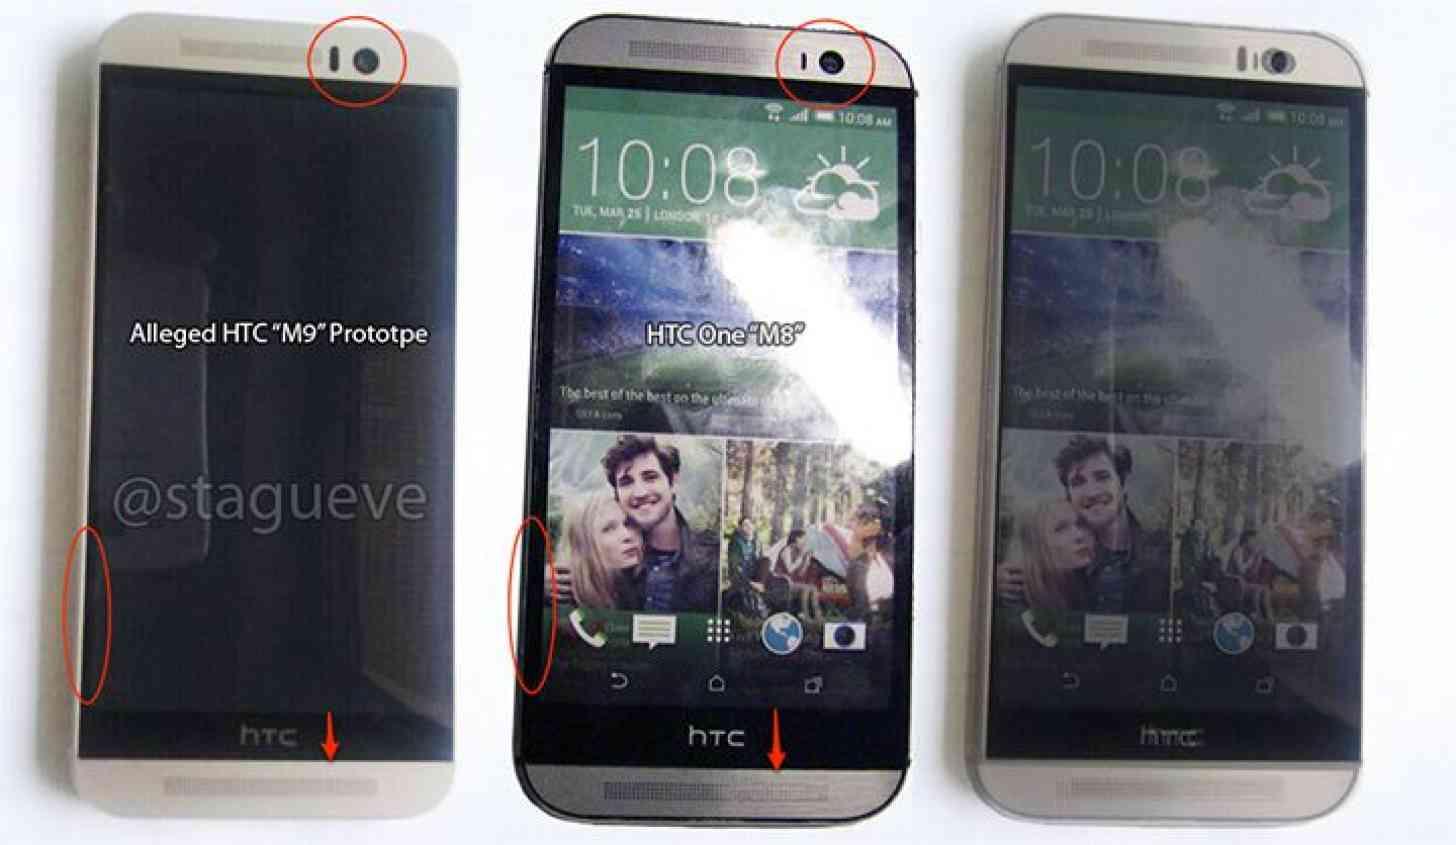 HTC One M9, One M8 comparison